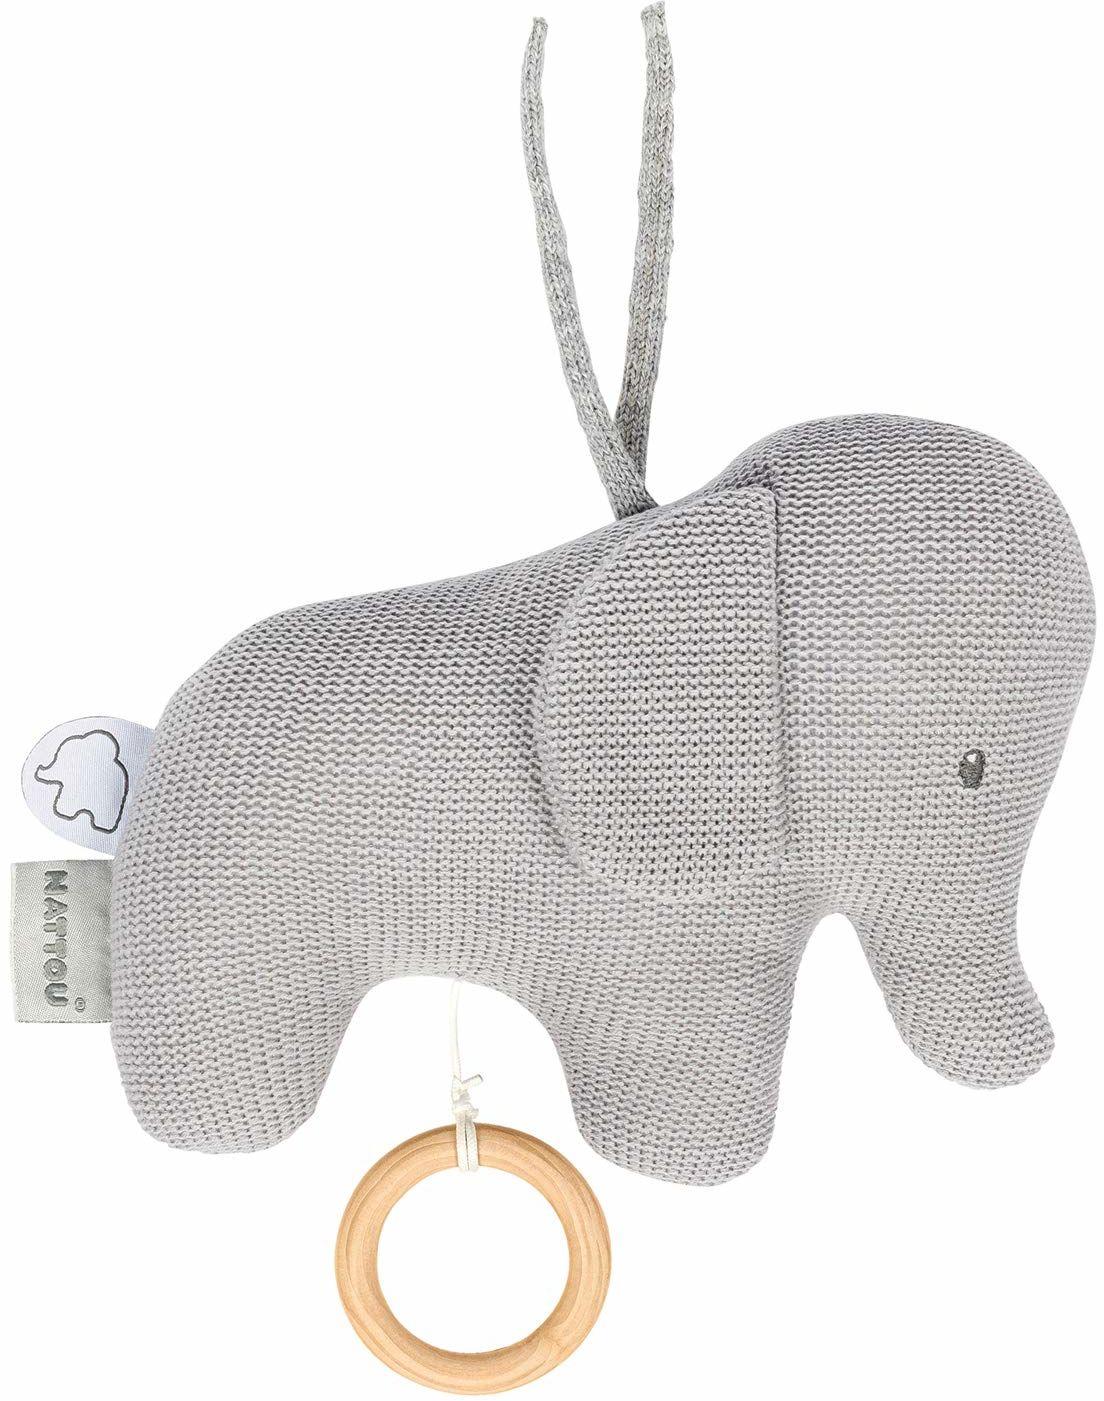 Nattou 929042 Tembo Cotton Knitted Elephant Musical Soft Toy pozytywka, szara (dziergana), 18 x 21 cm